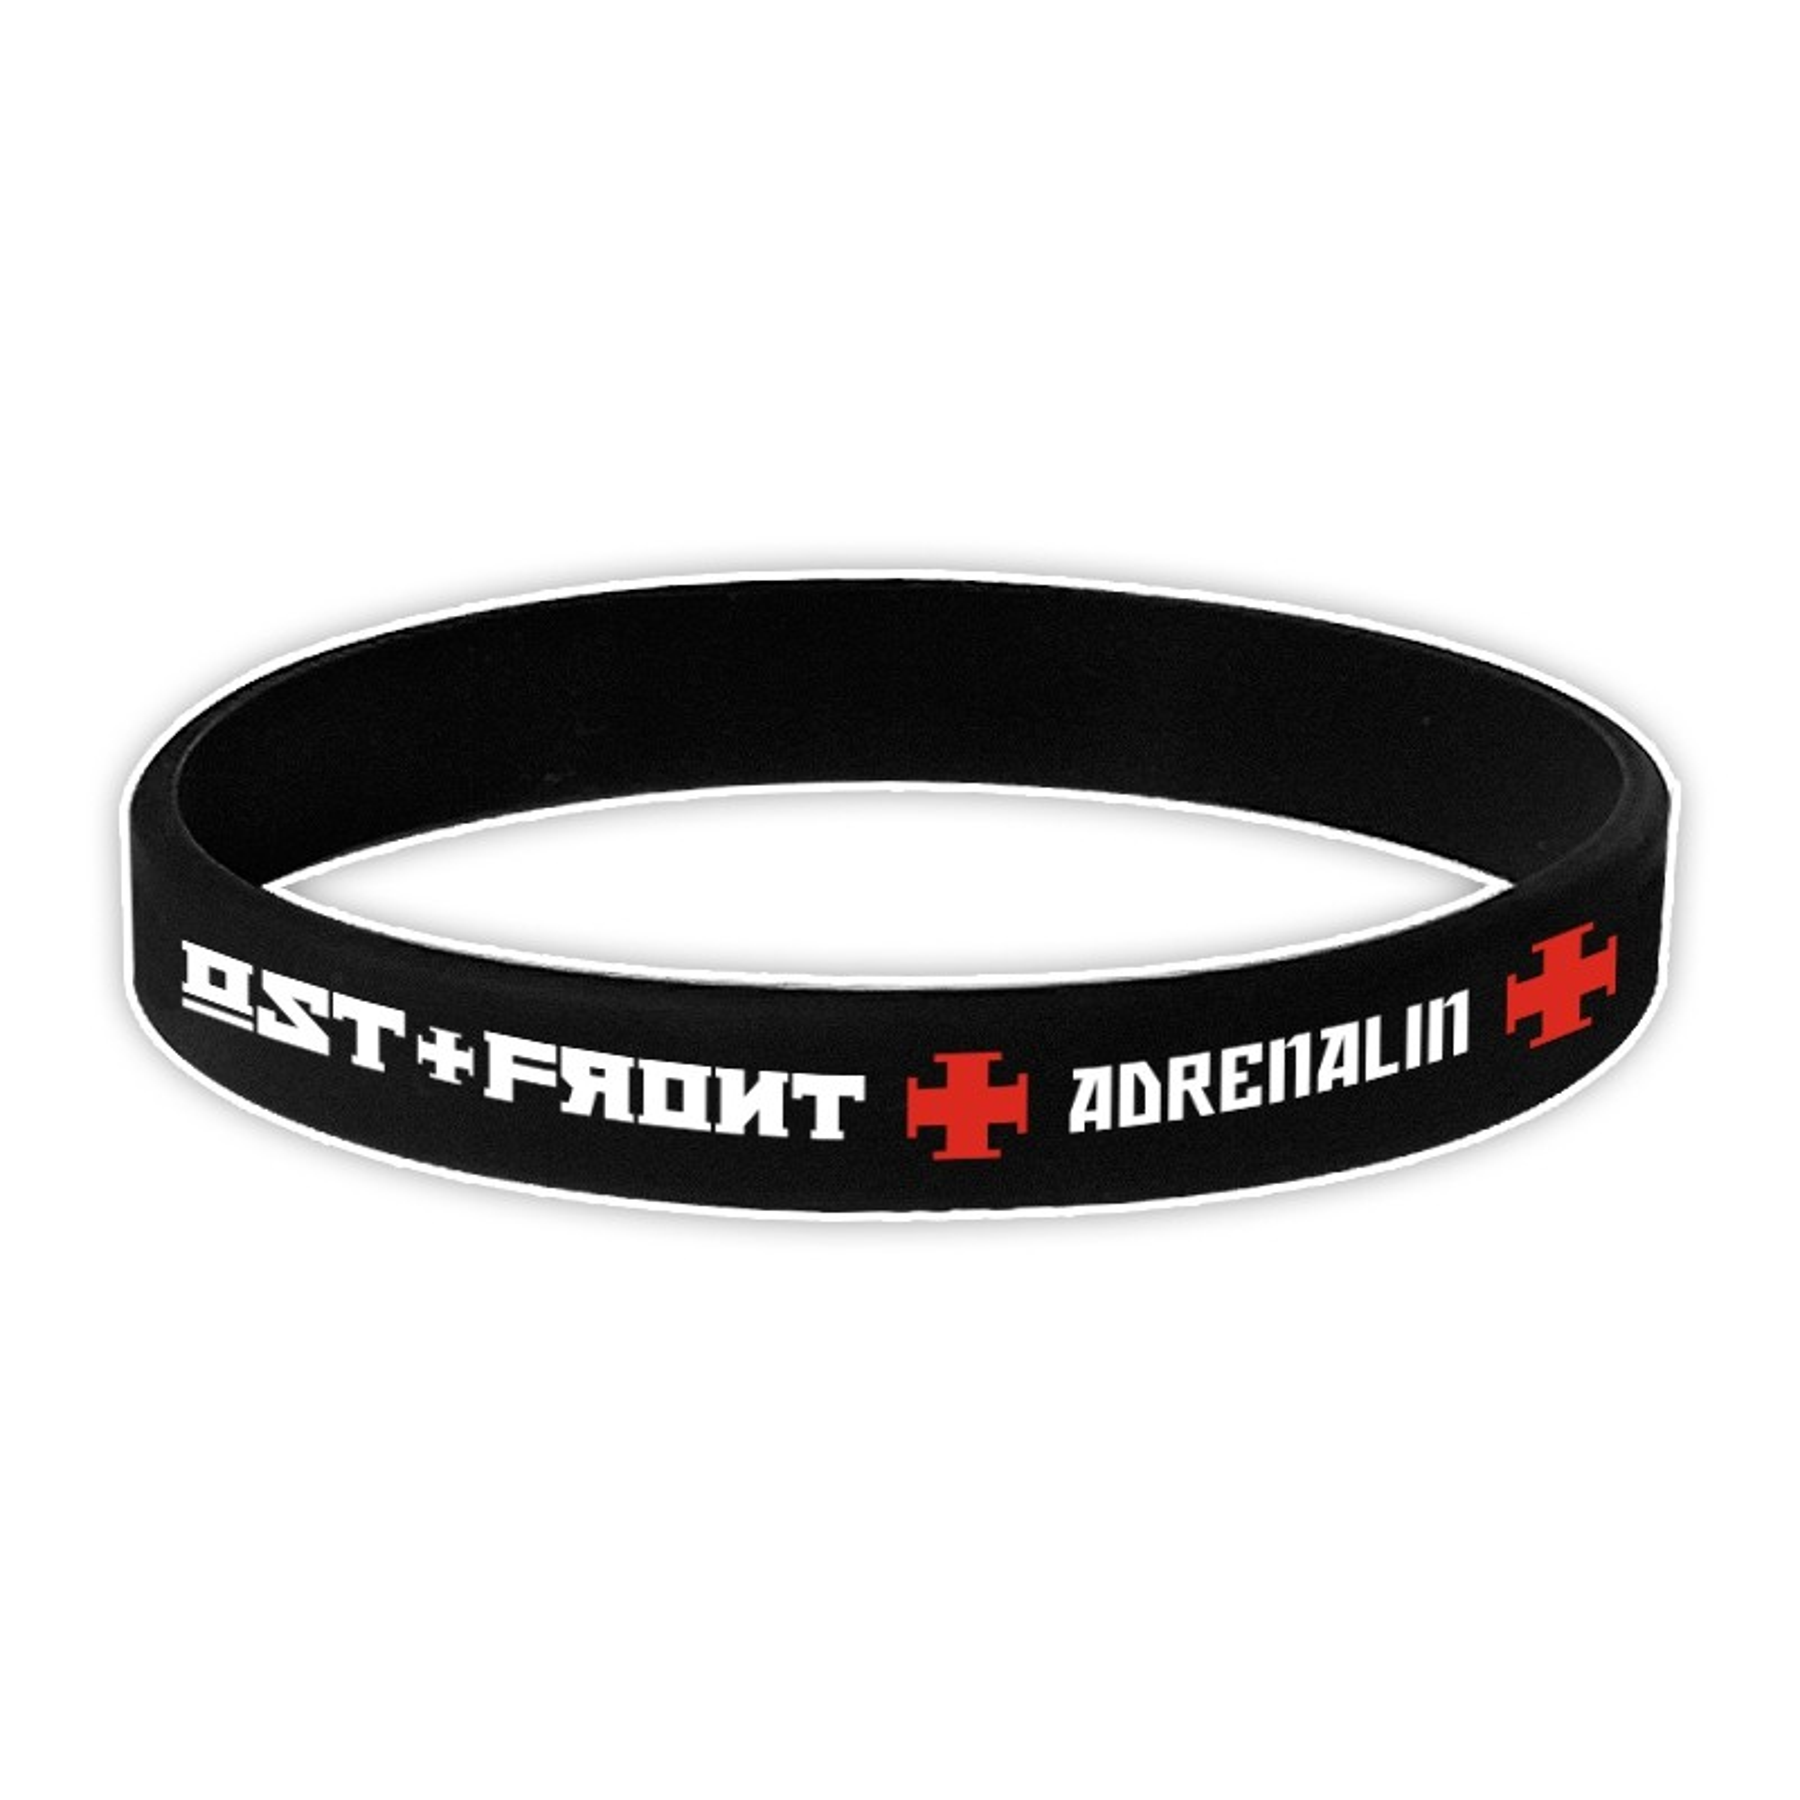 OST+FRONT - Adrenalin - Silikonarmband/Silicone Wrist Band